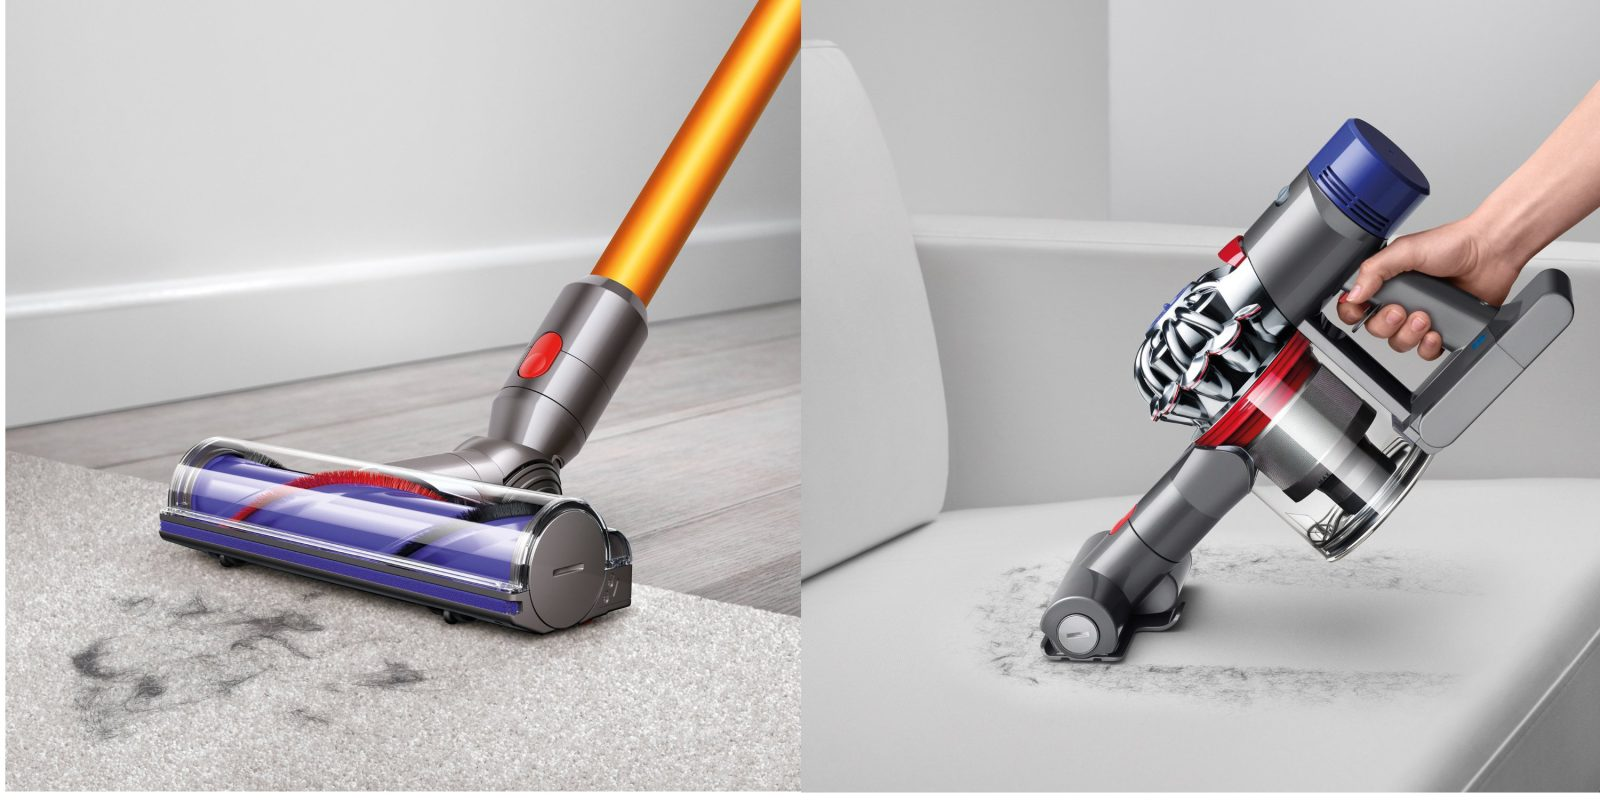 Handheld dyson vacuum cleaner фильтр для dyson dc45